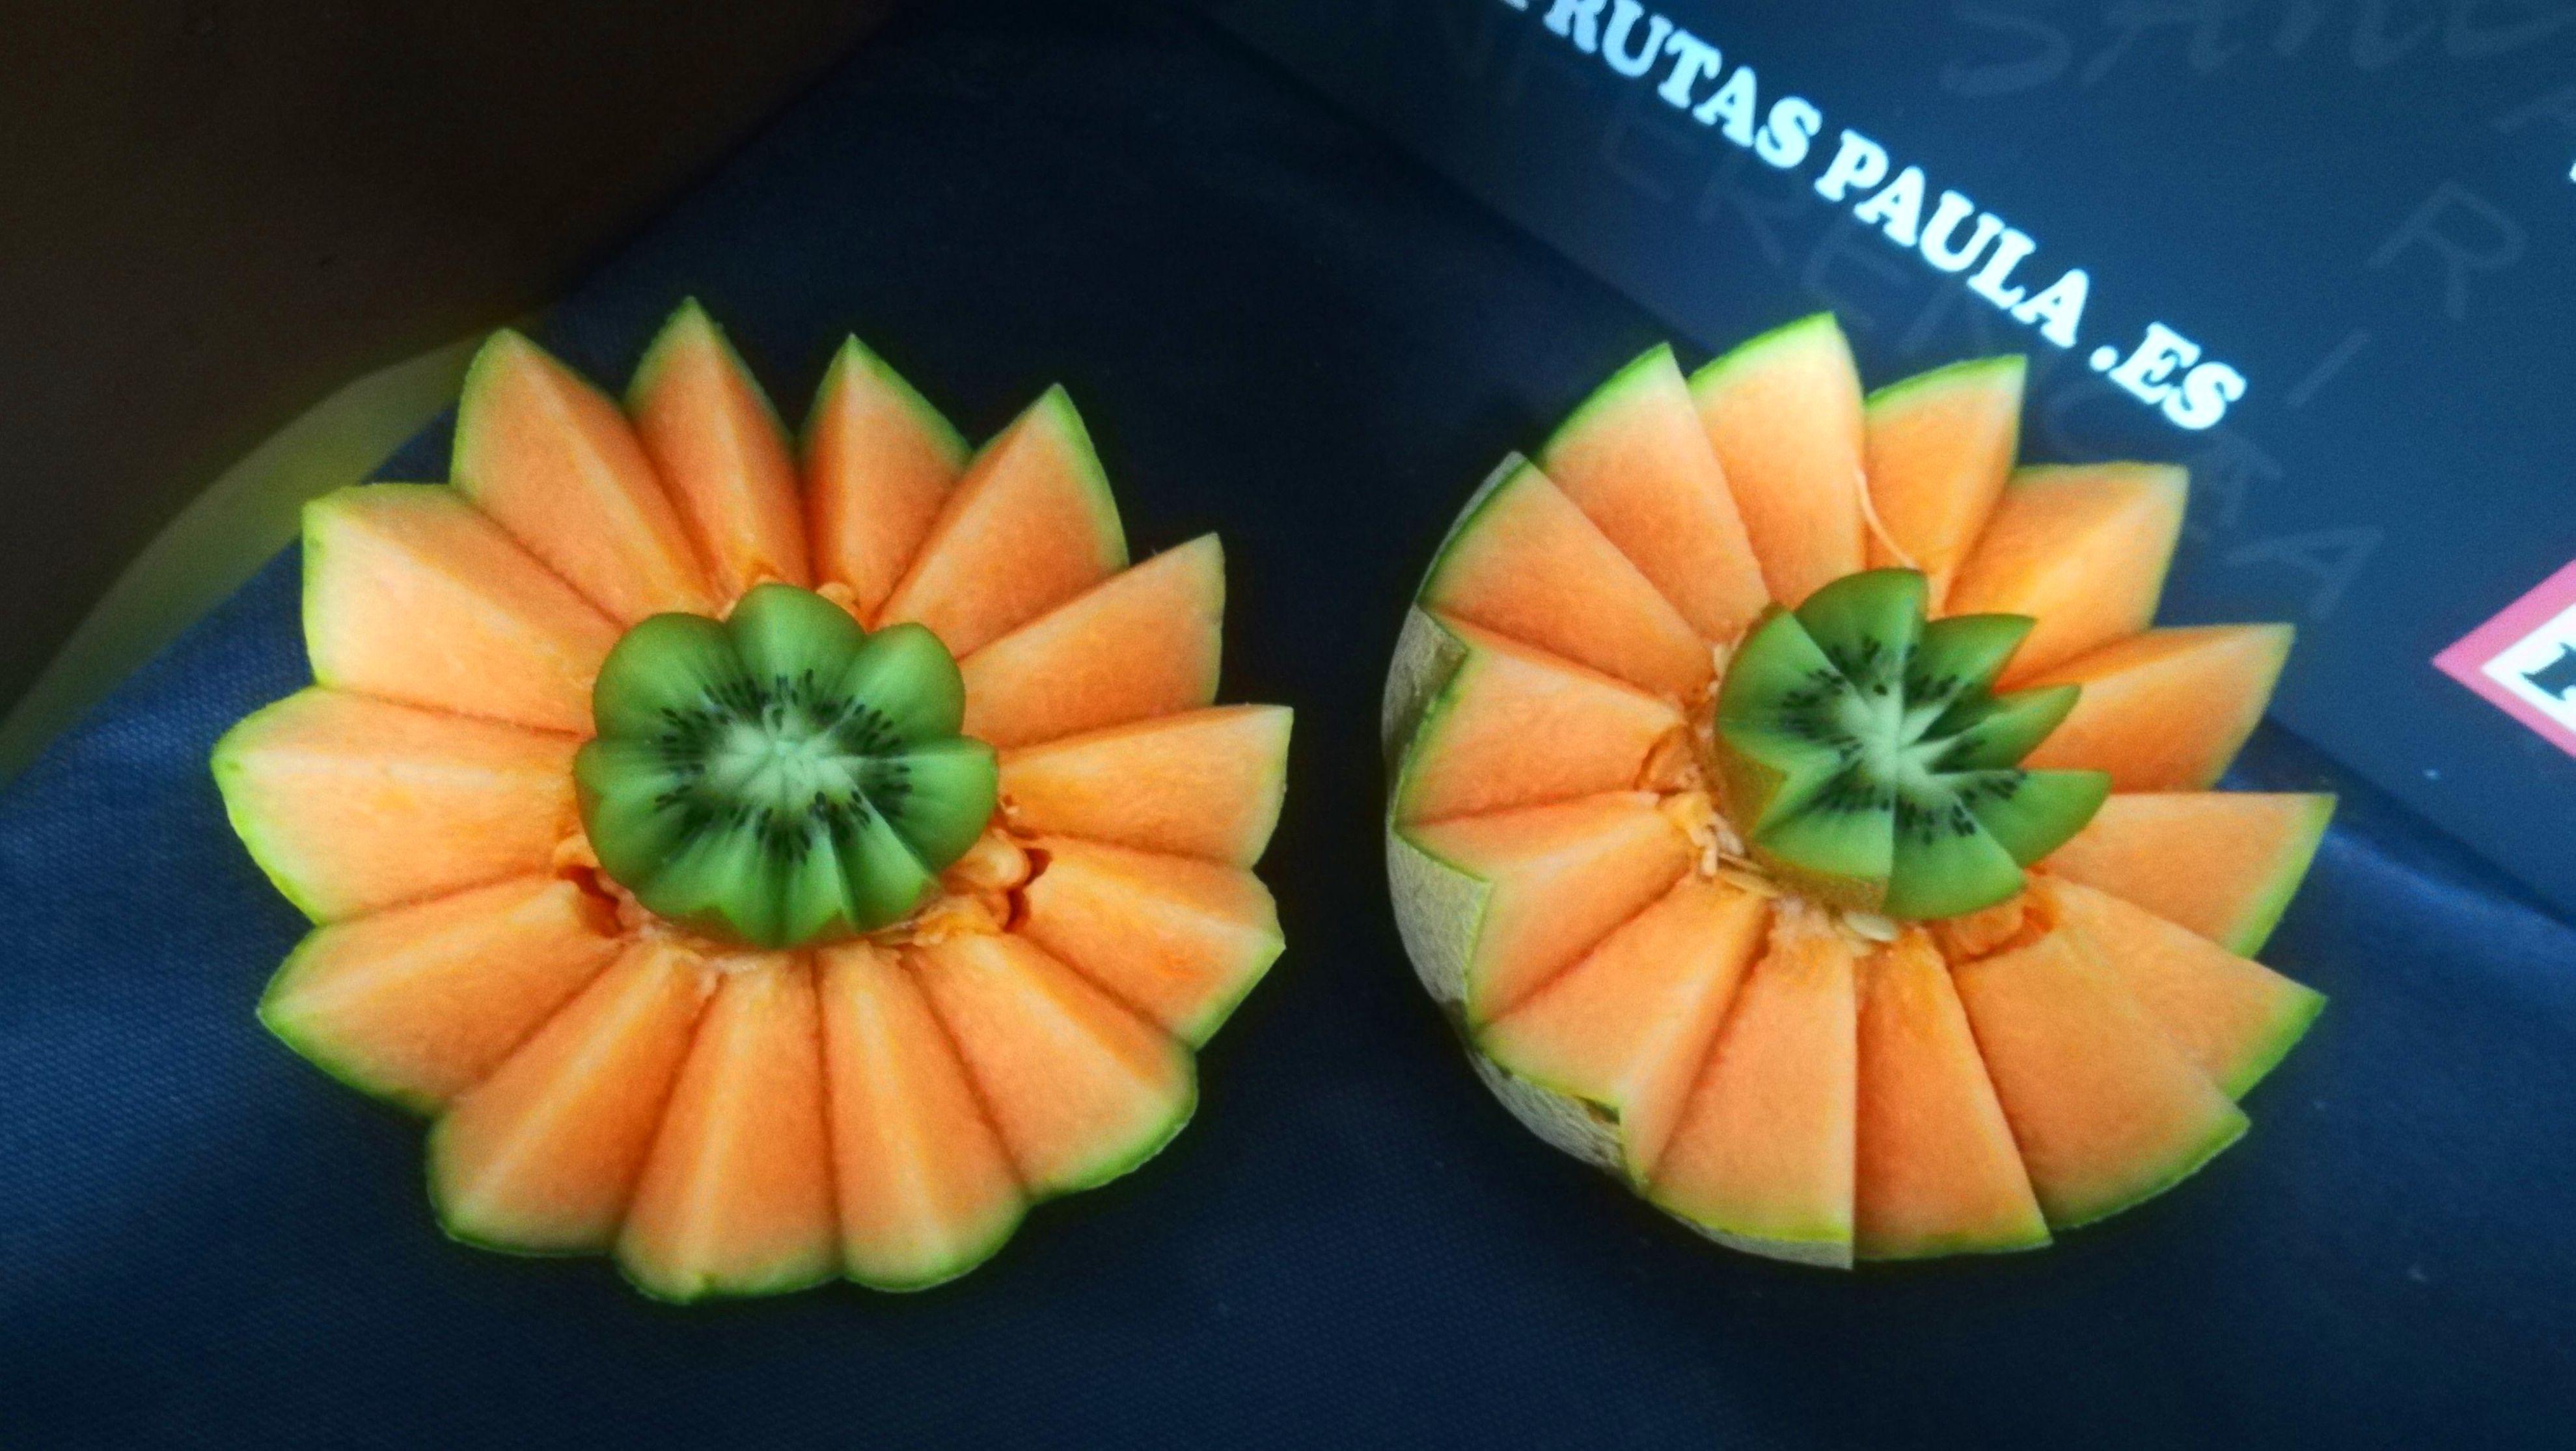 Melon Cantalupo en Frutas Paula